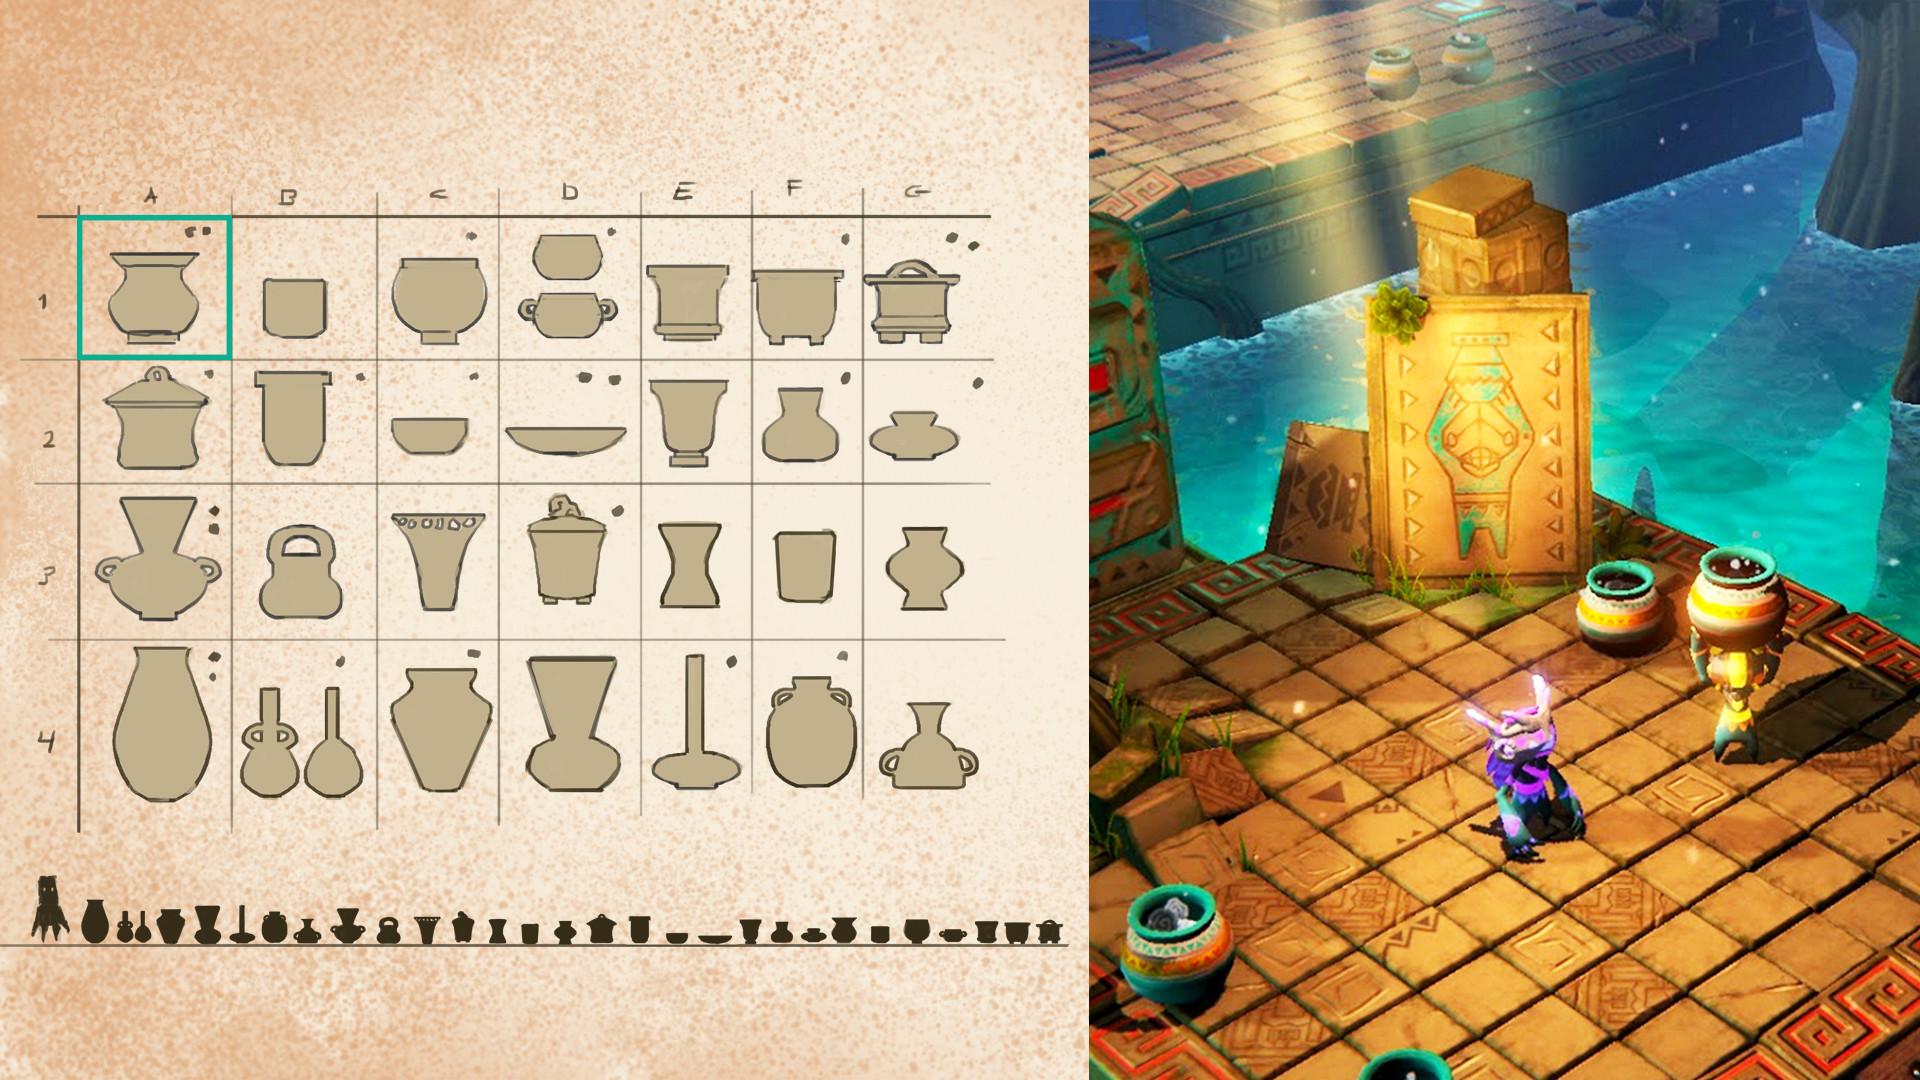 Noah carev concept vase